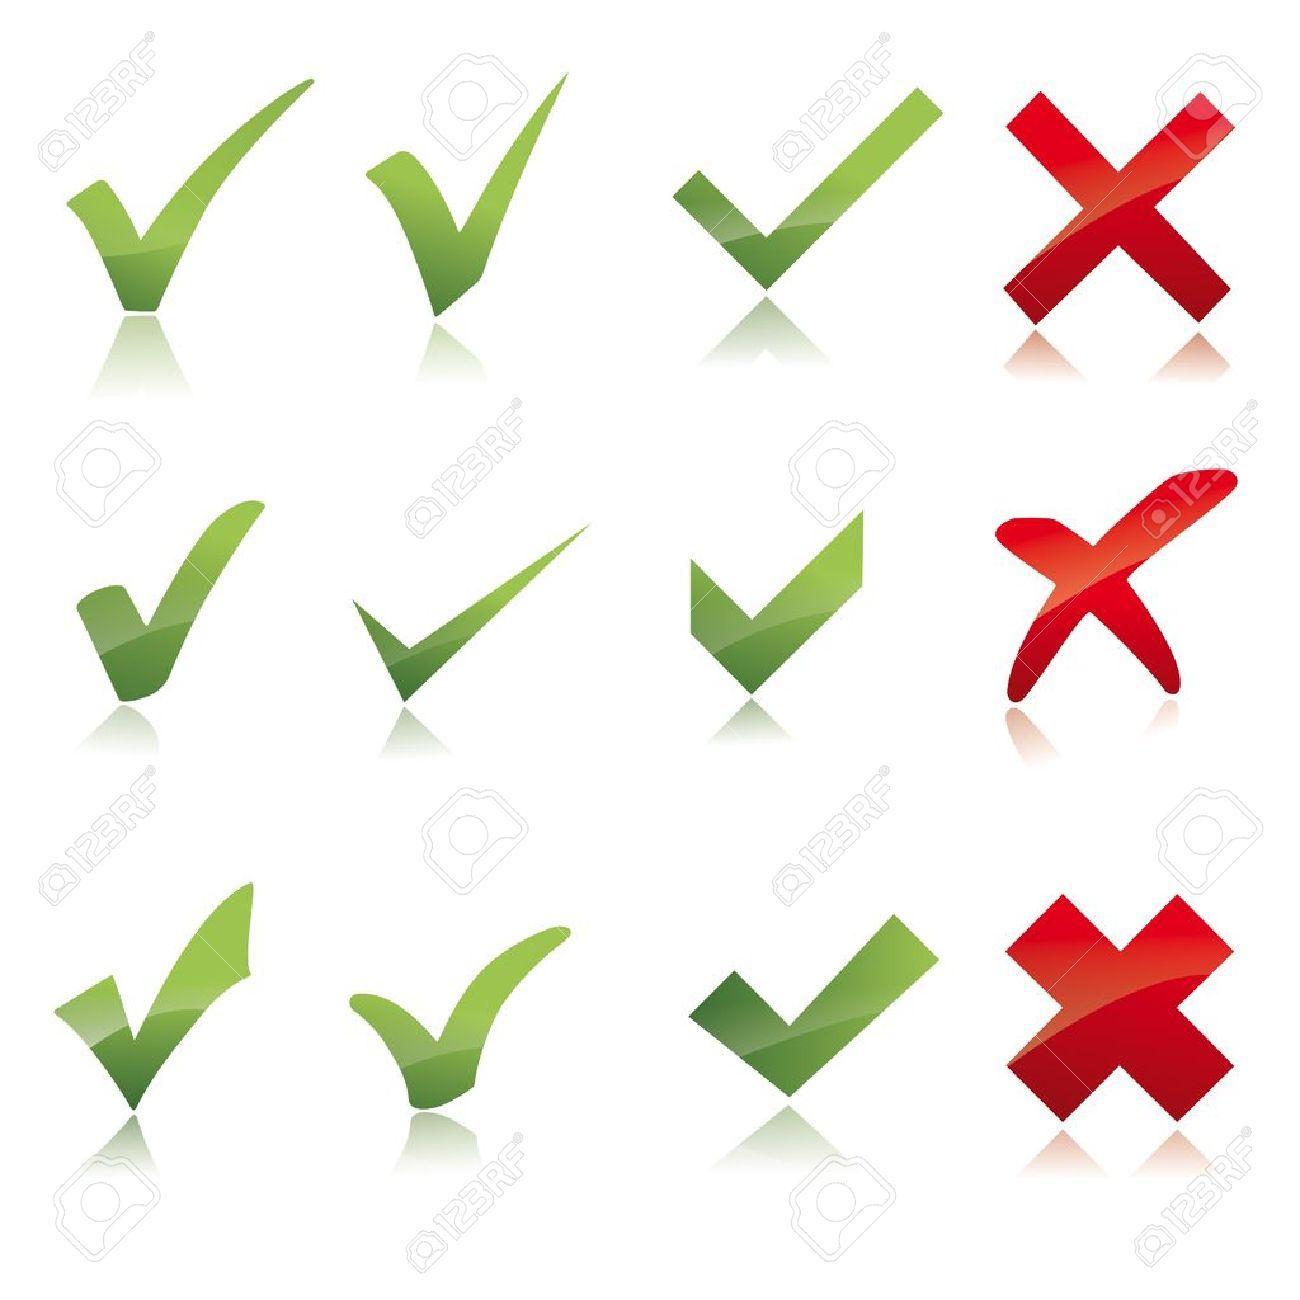 Vector Green X check haken sign icon red X cross set - 12410951